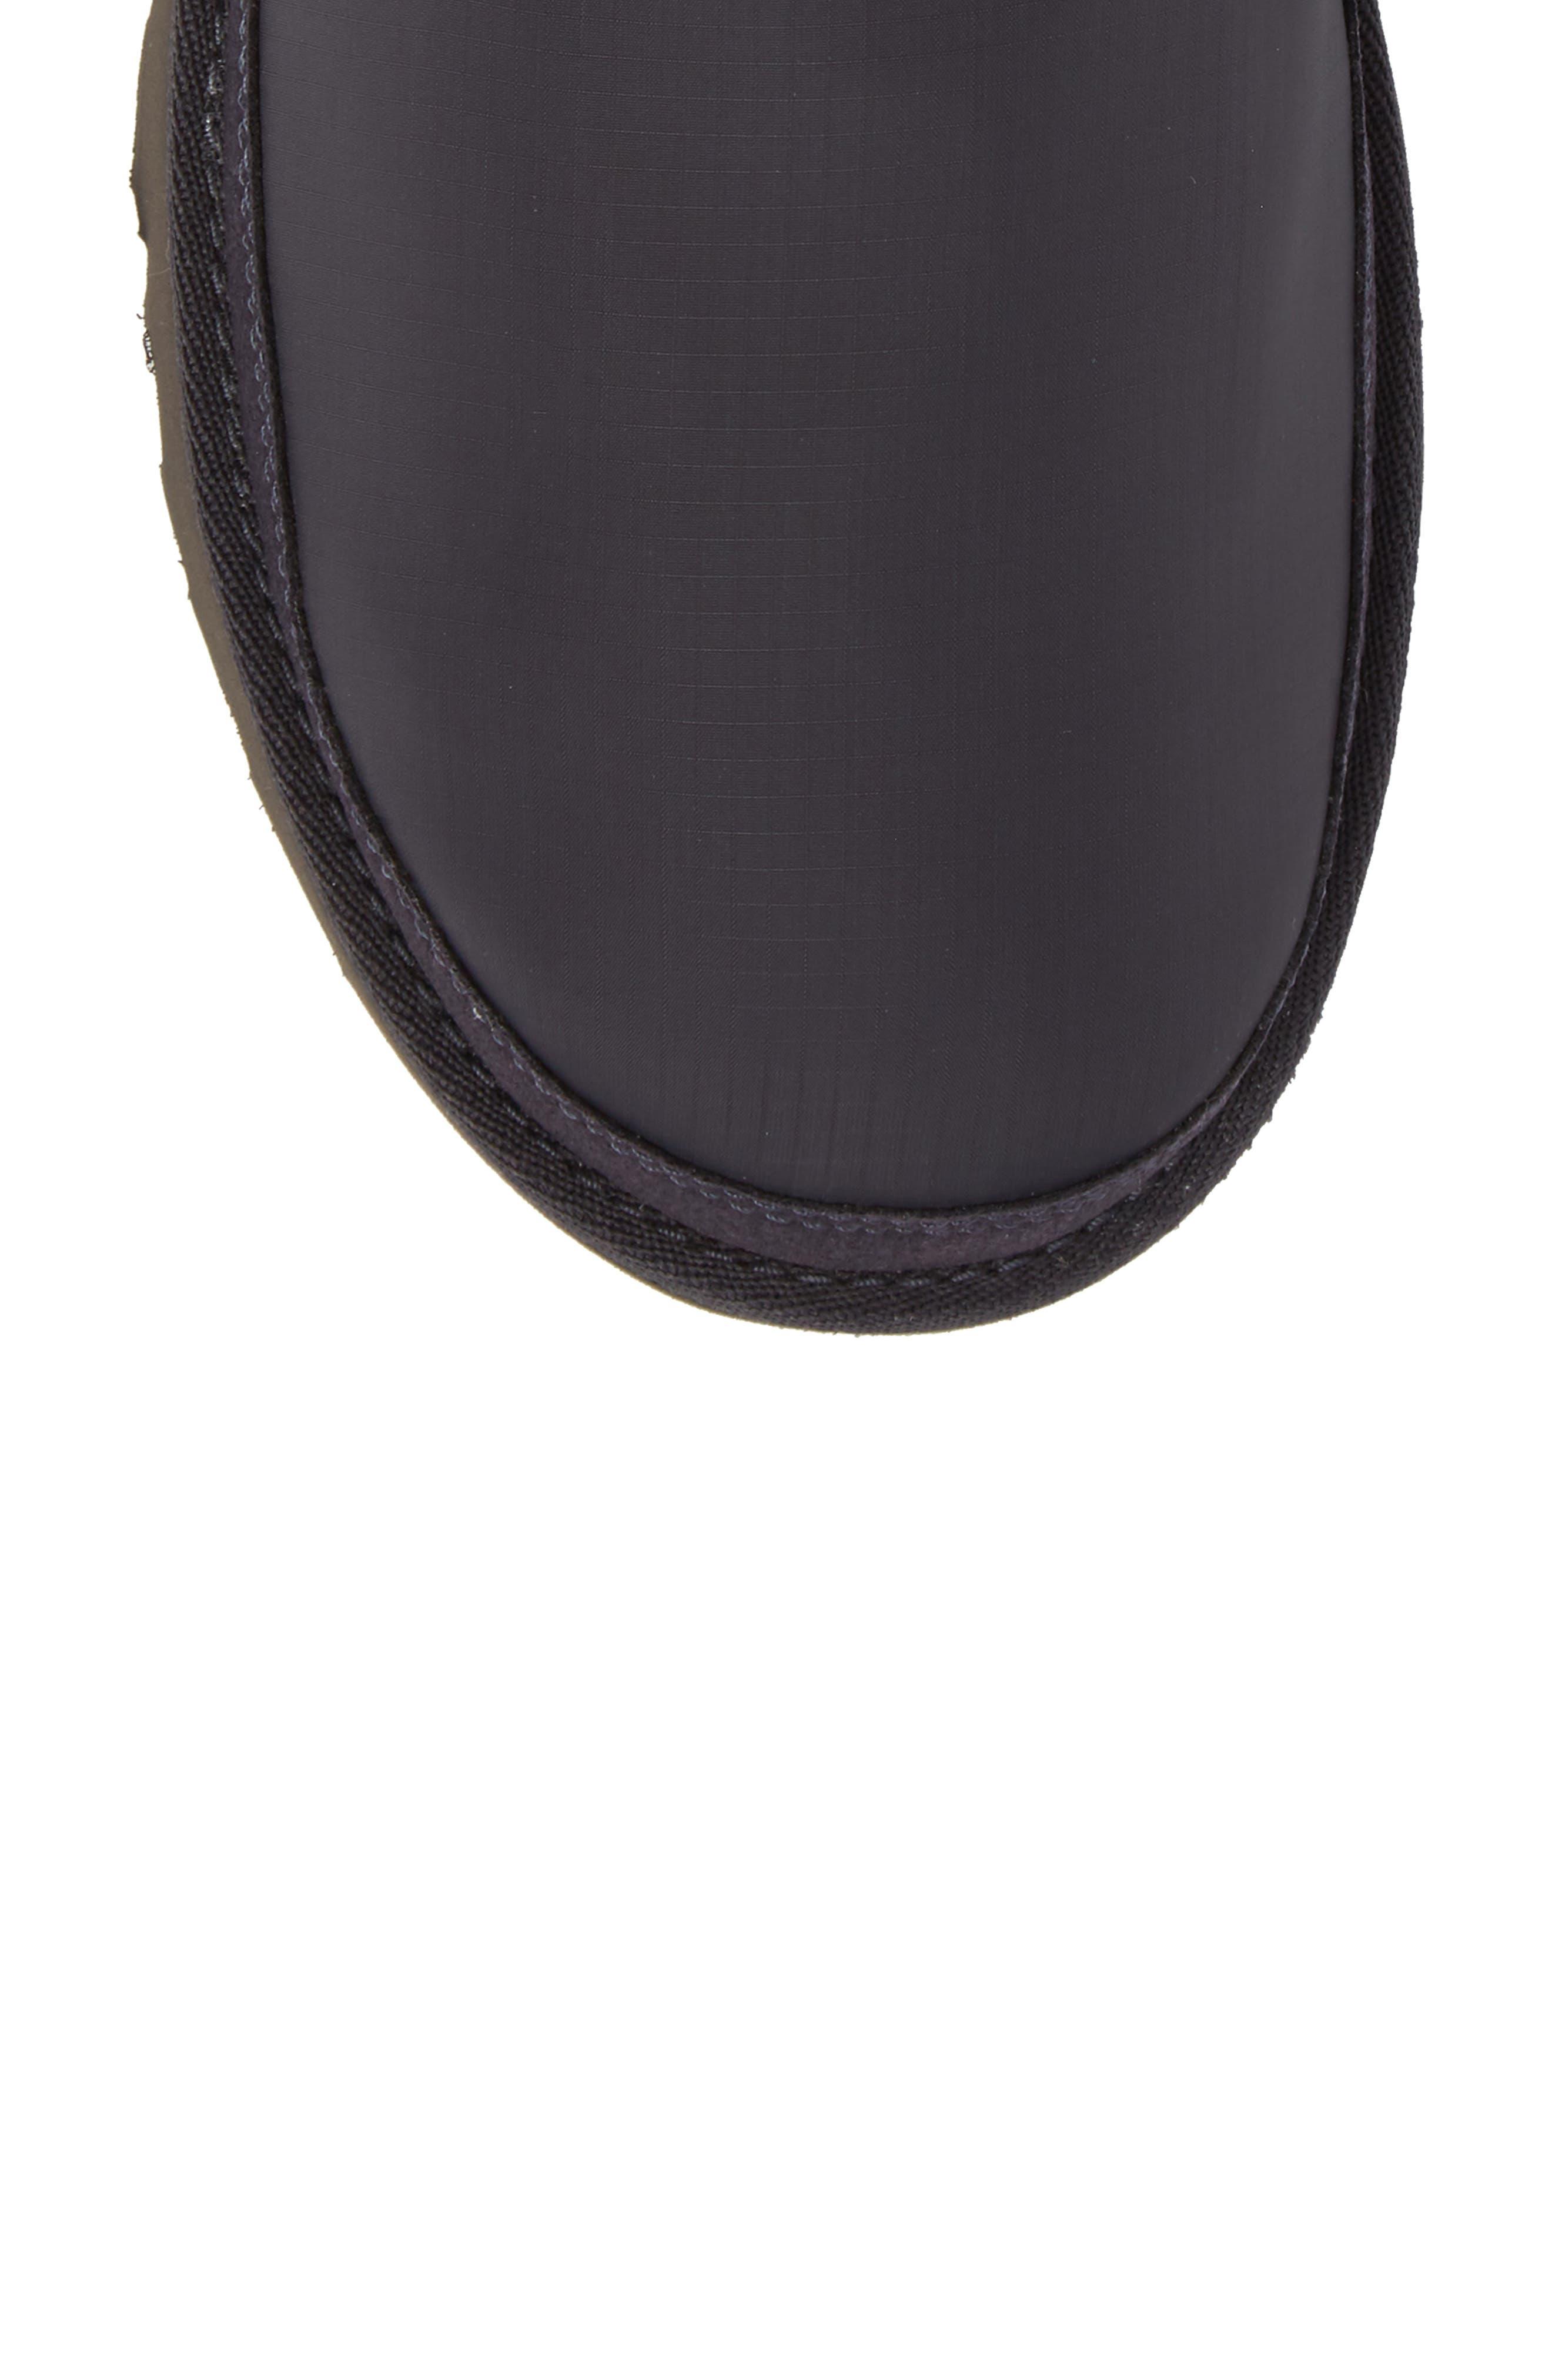 Neumel Ripstop Chukka Boot,                             Alternate thumbnail 5, color,                             True Navy Leather